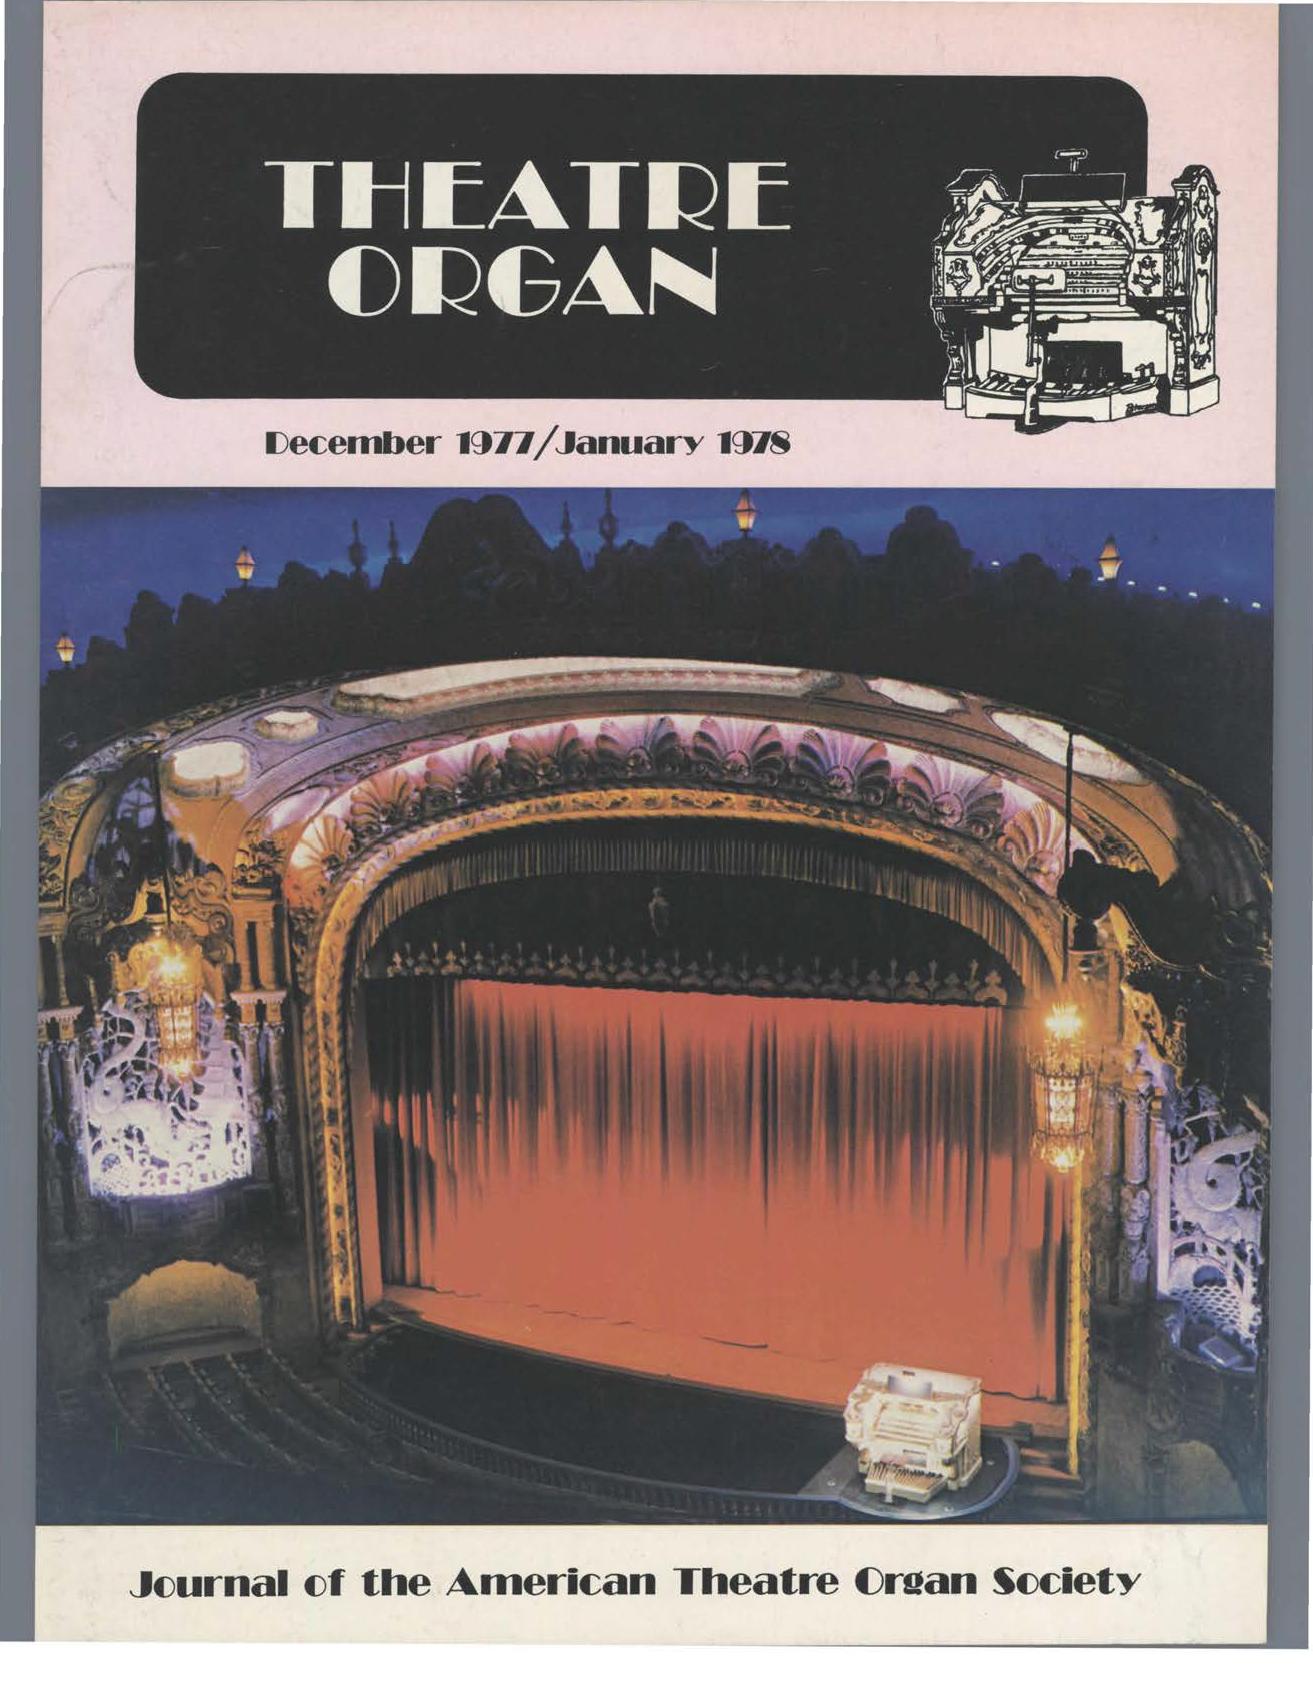 Theatre Organ, December - January 1977, Volume 19, Number 6